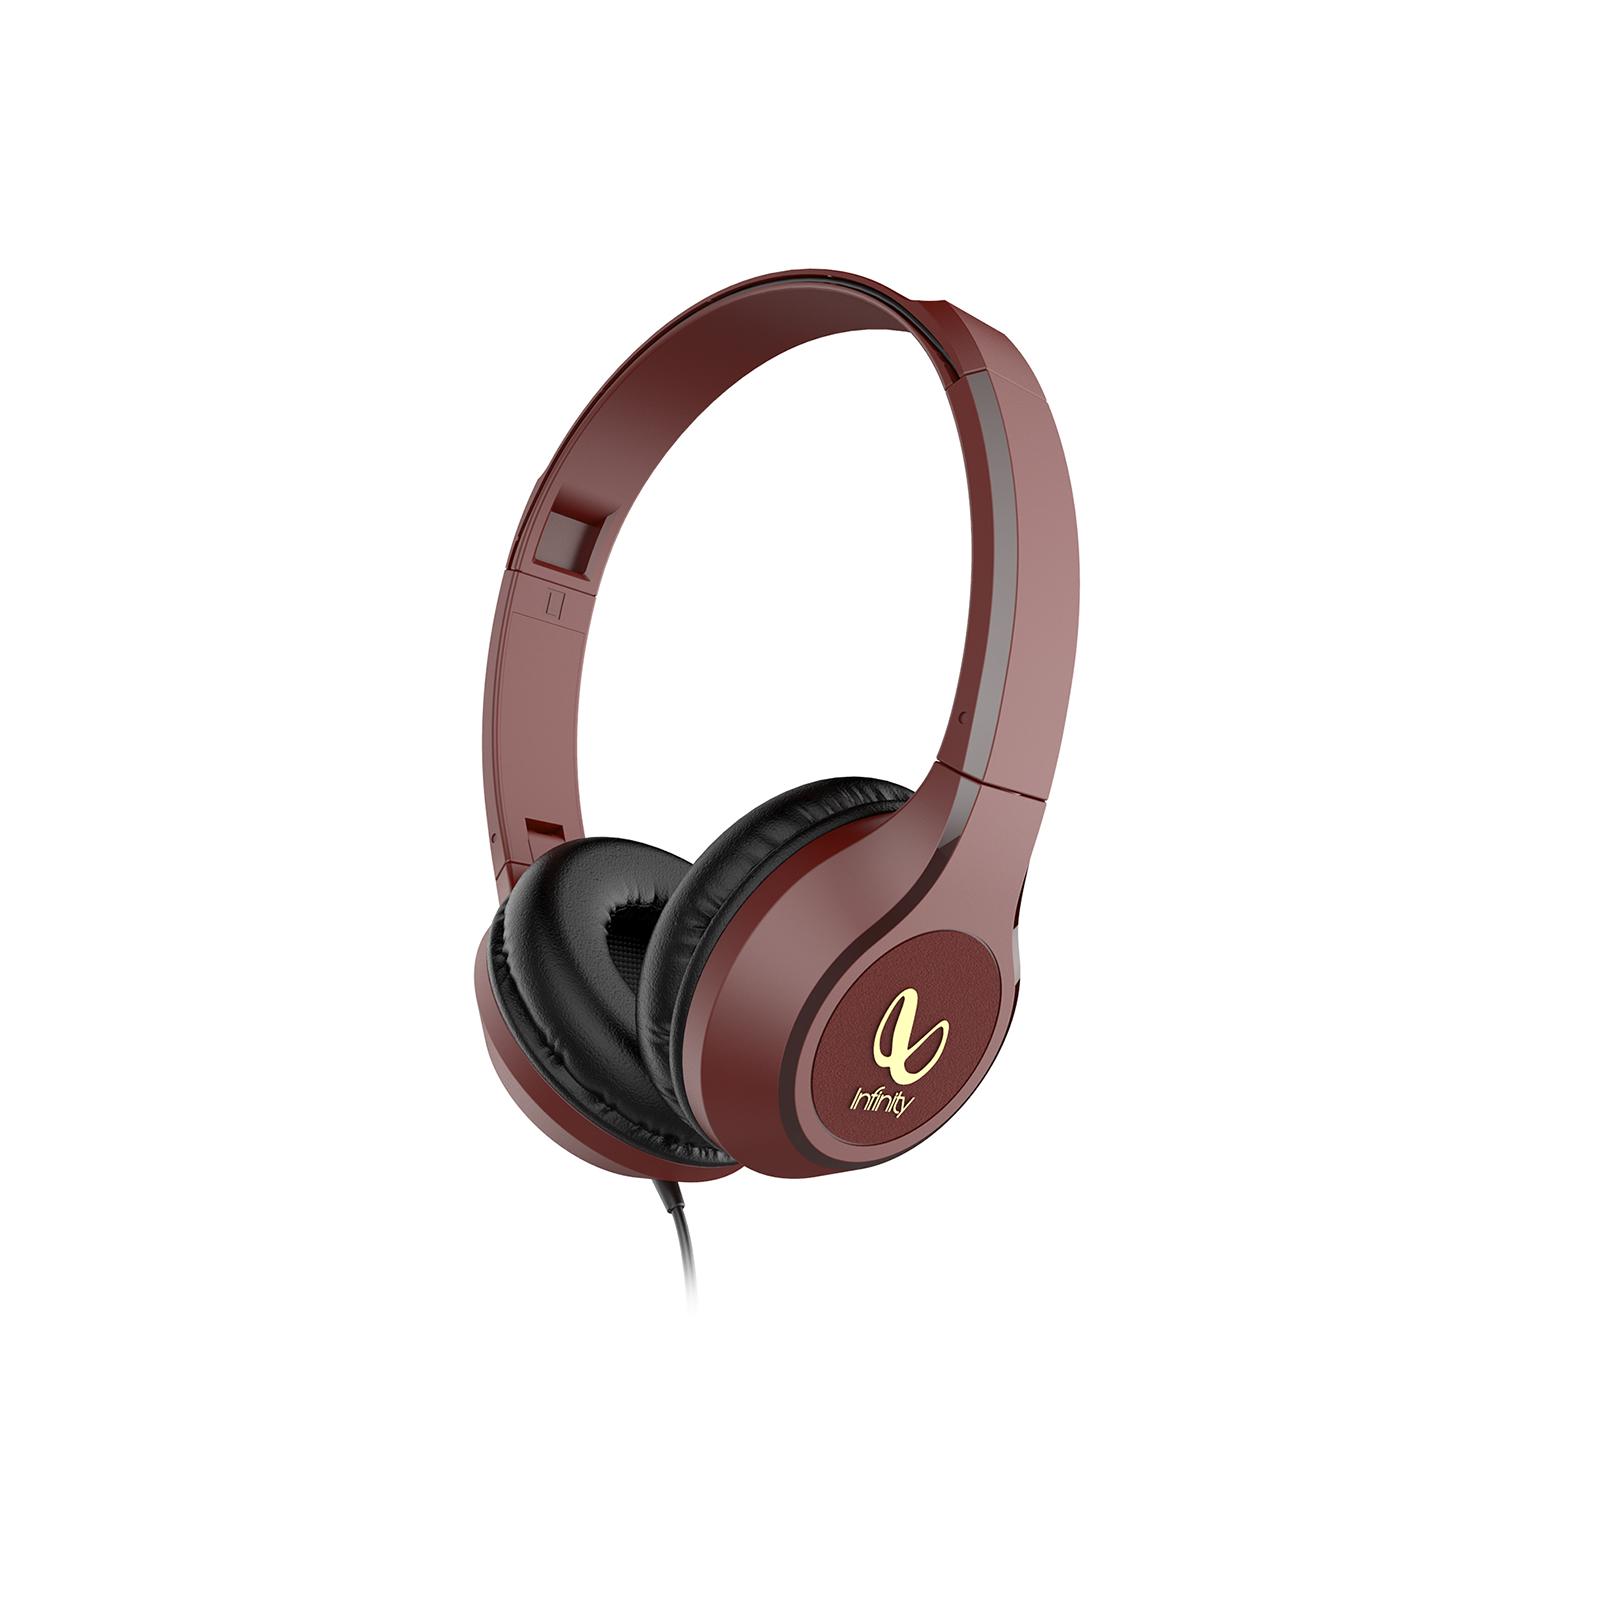 INFINITY ZIP 500 - Red - On-Ear Wired Headphones - Hero